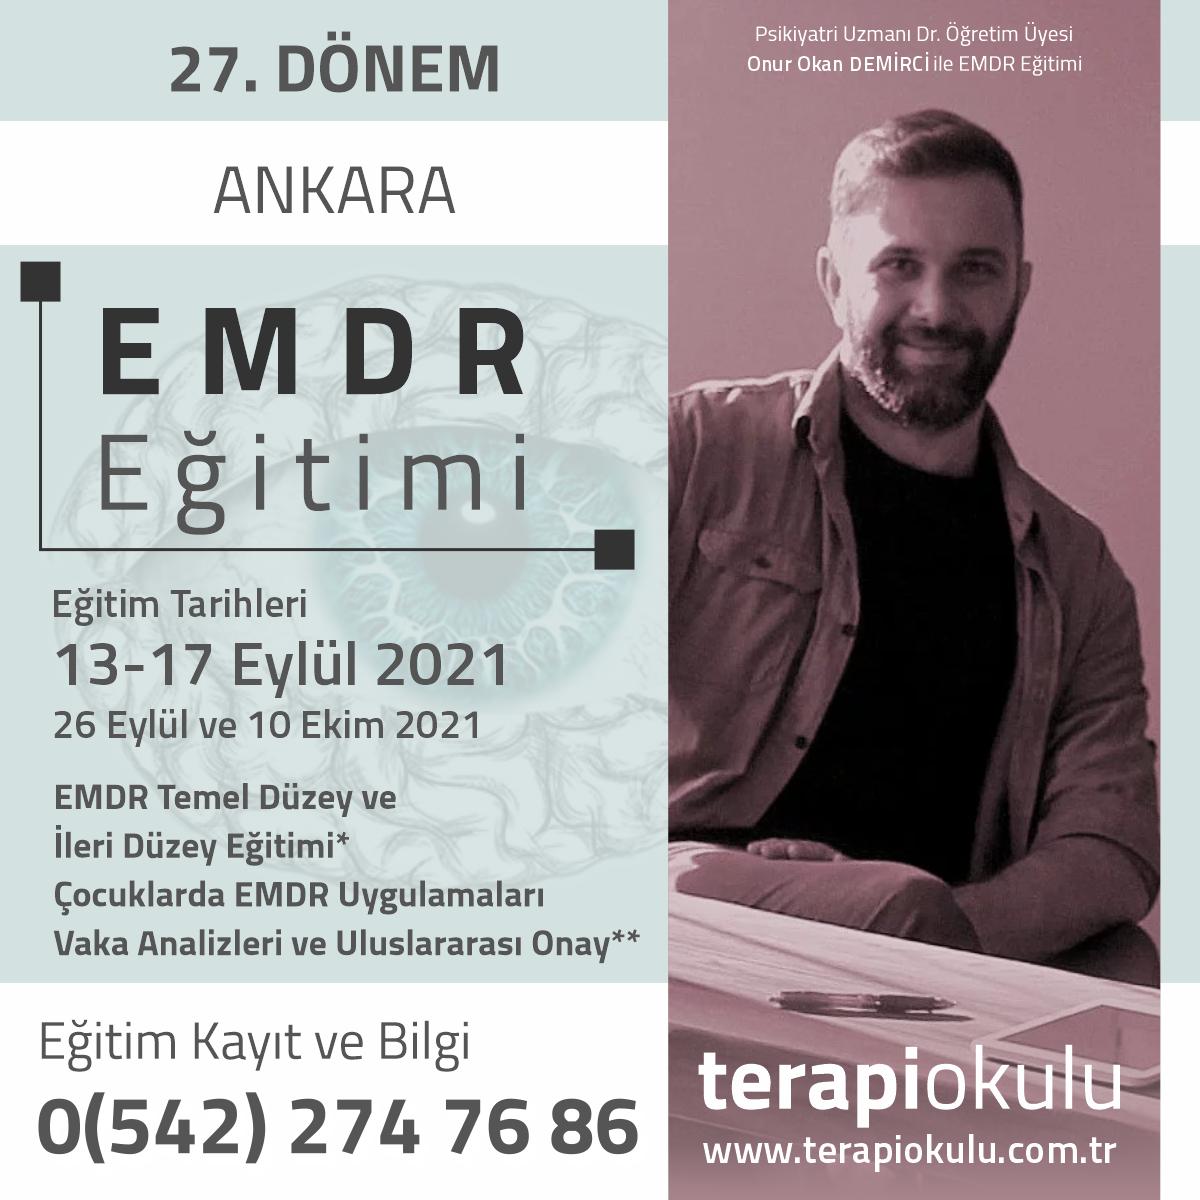 EMDR Eğitimi Ankara 27